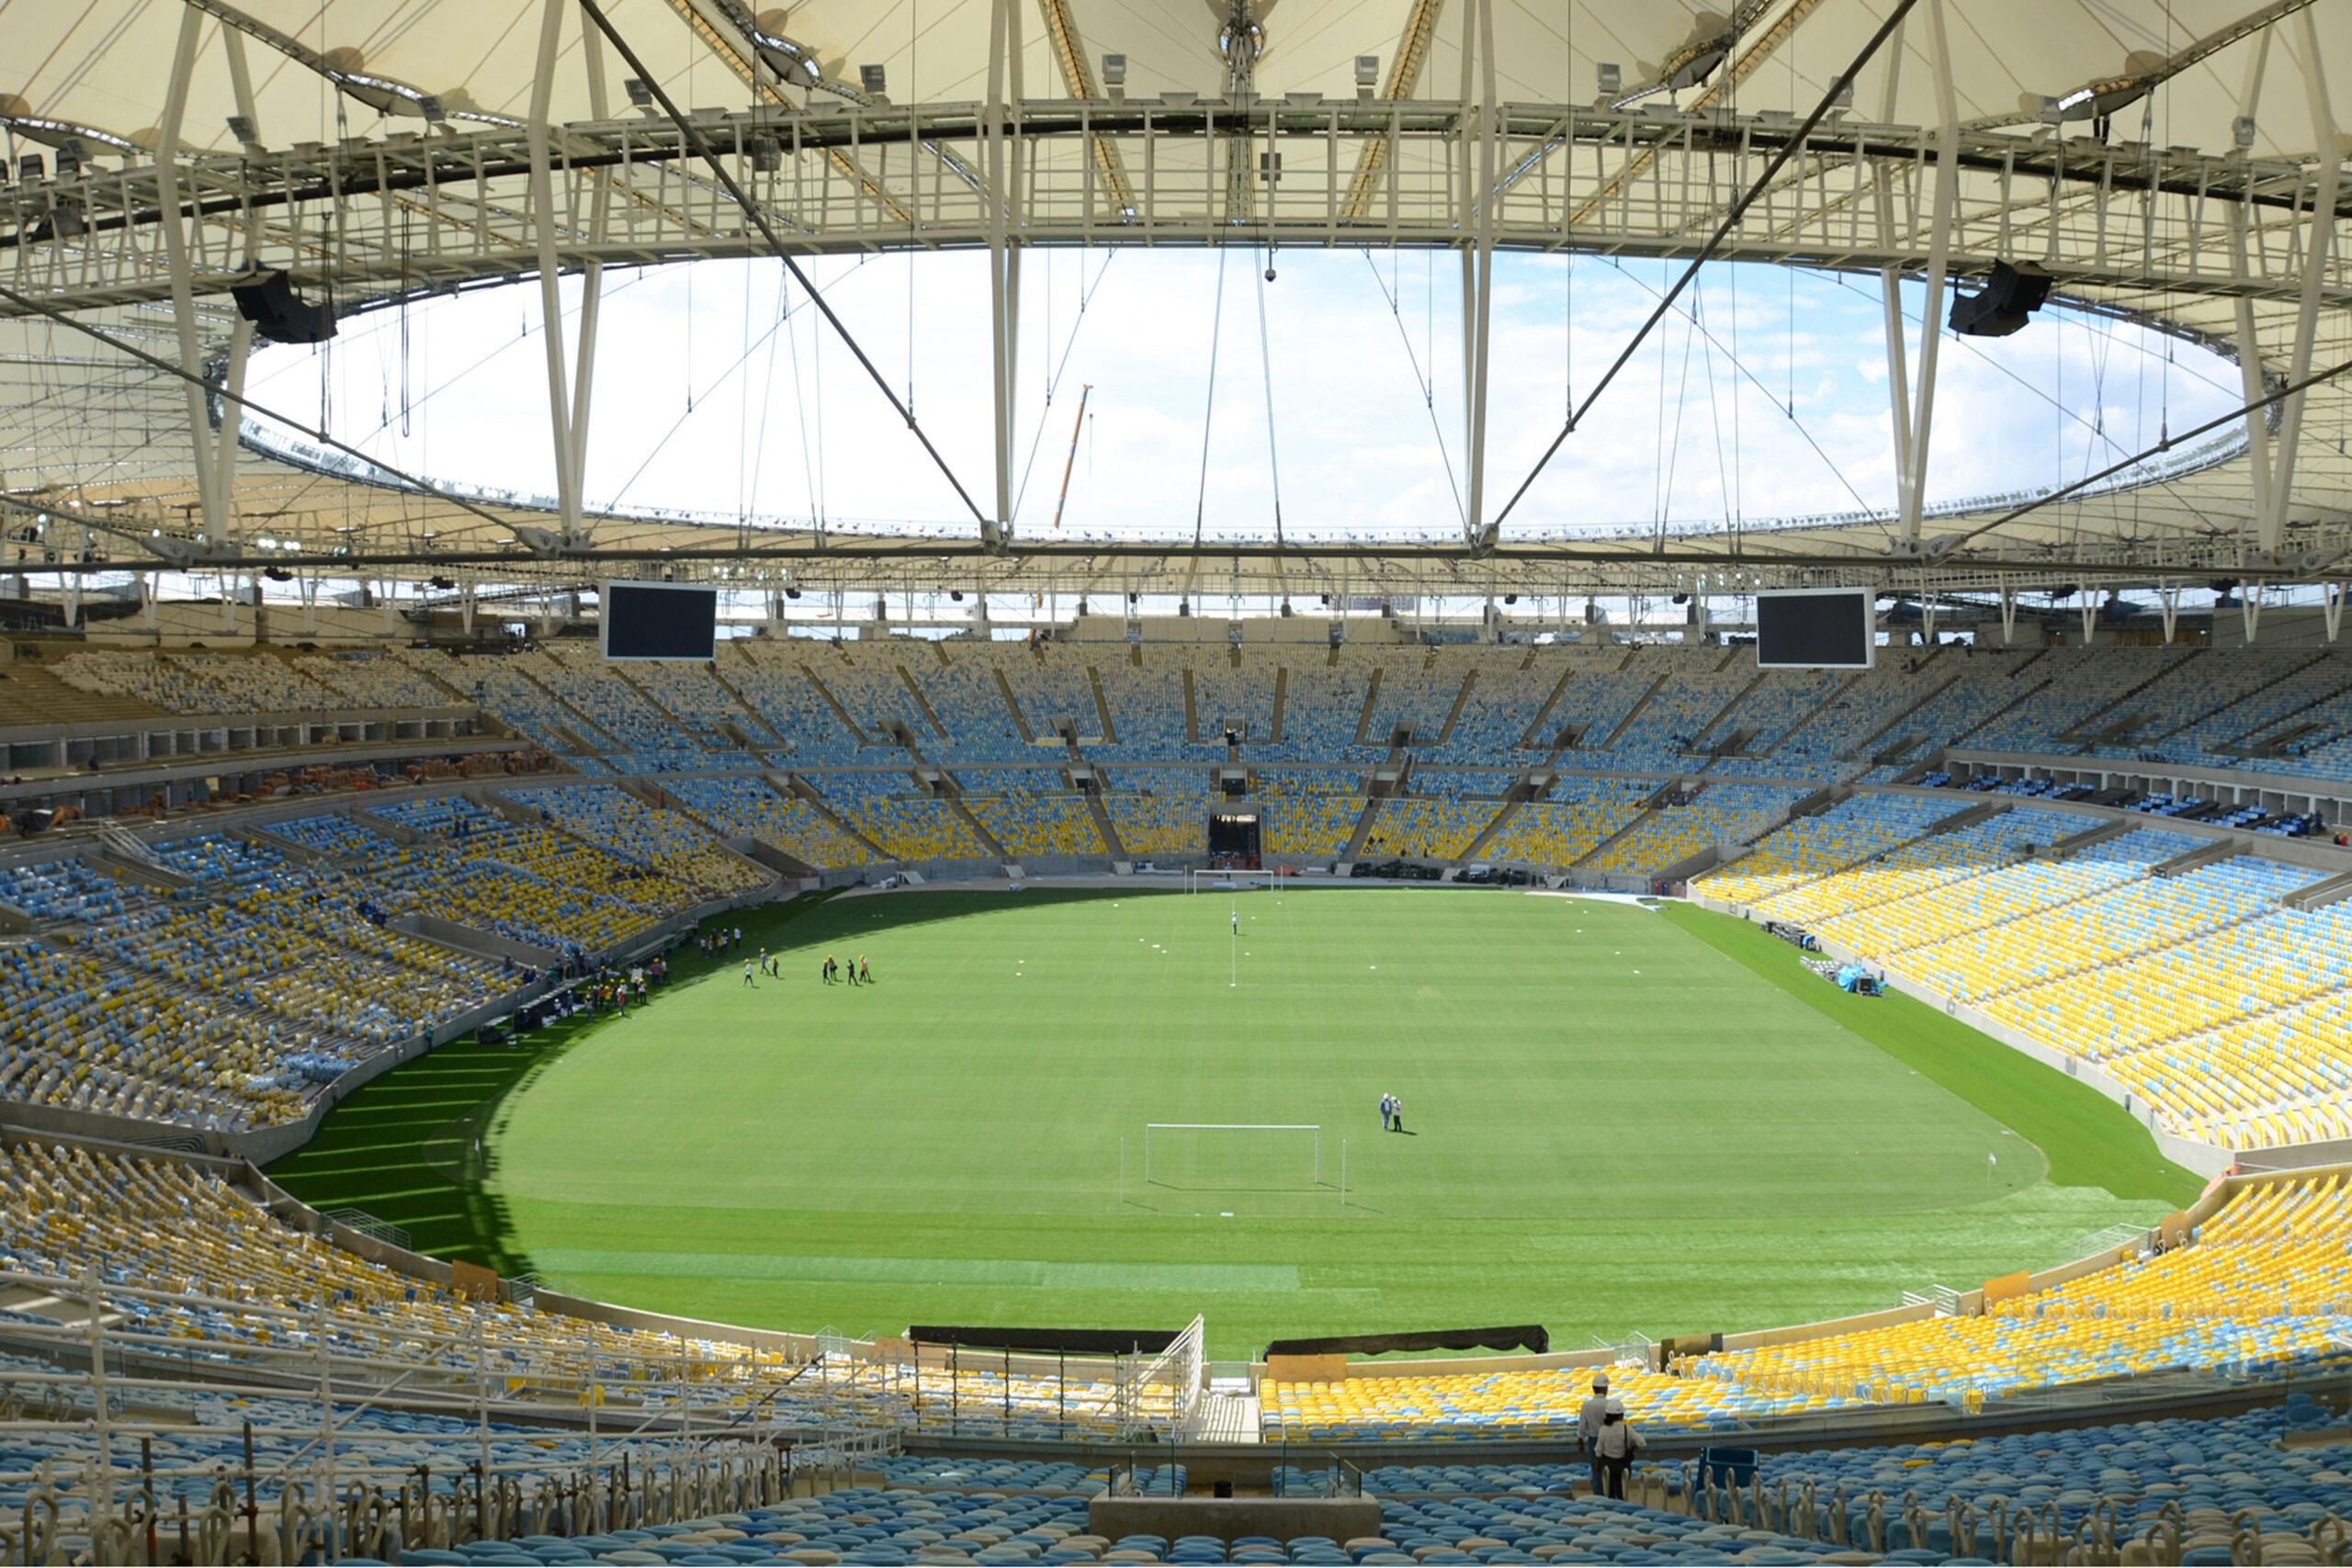 maracanã stadium in brazil